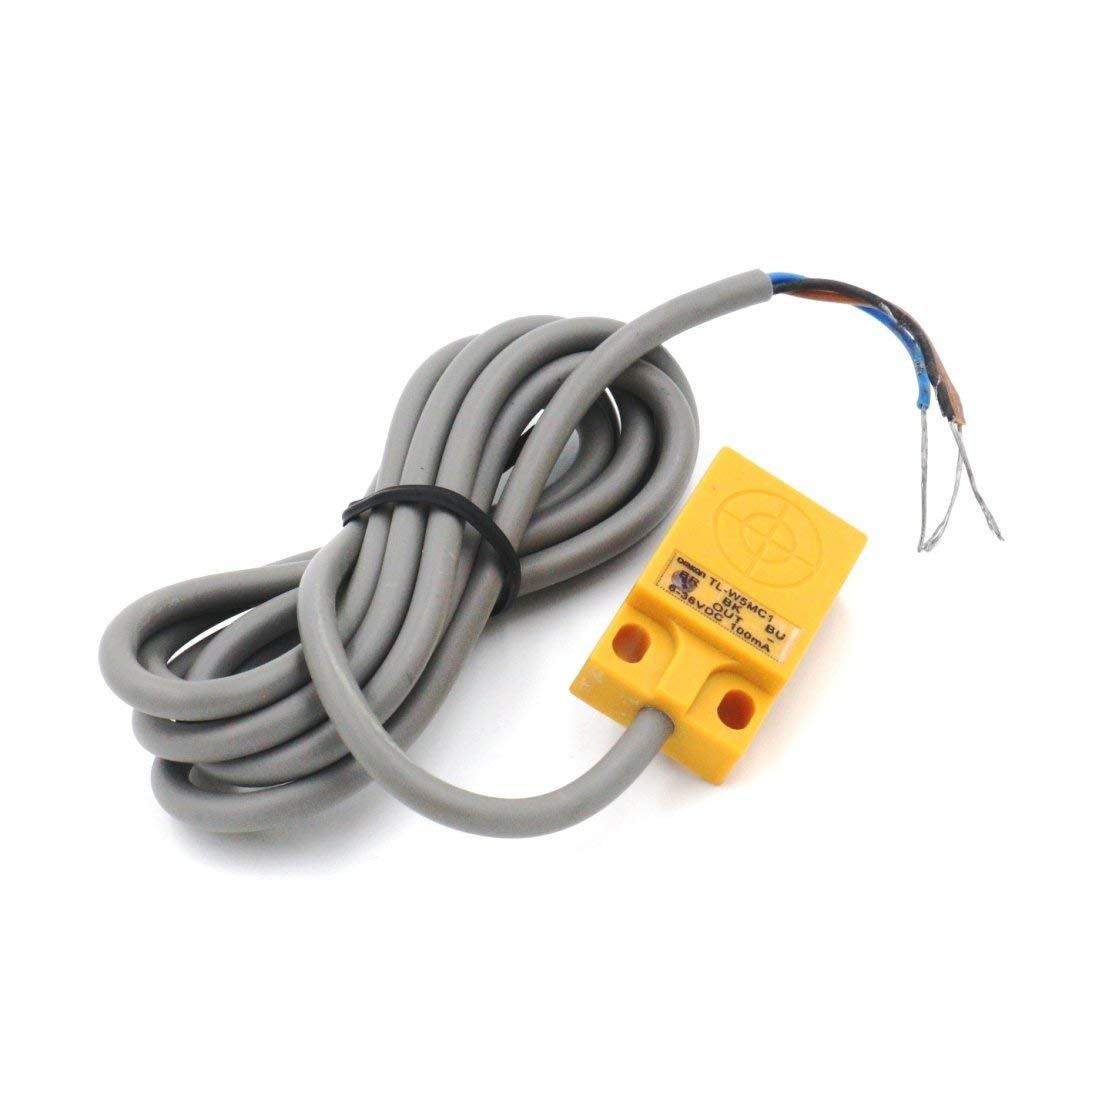 TL-W5MC1 5mm 3 Wire Inductive Proximity Sensor Detection Switch NPN DC 6-36V